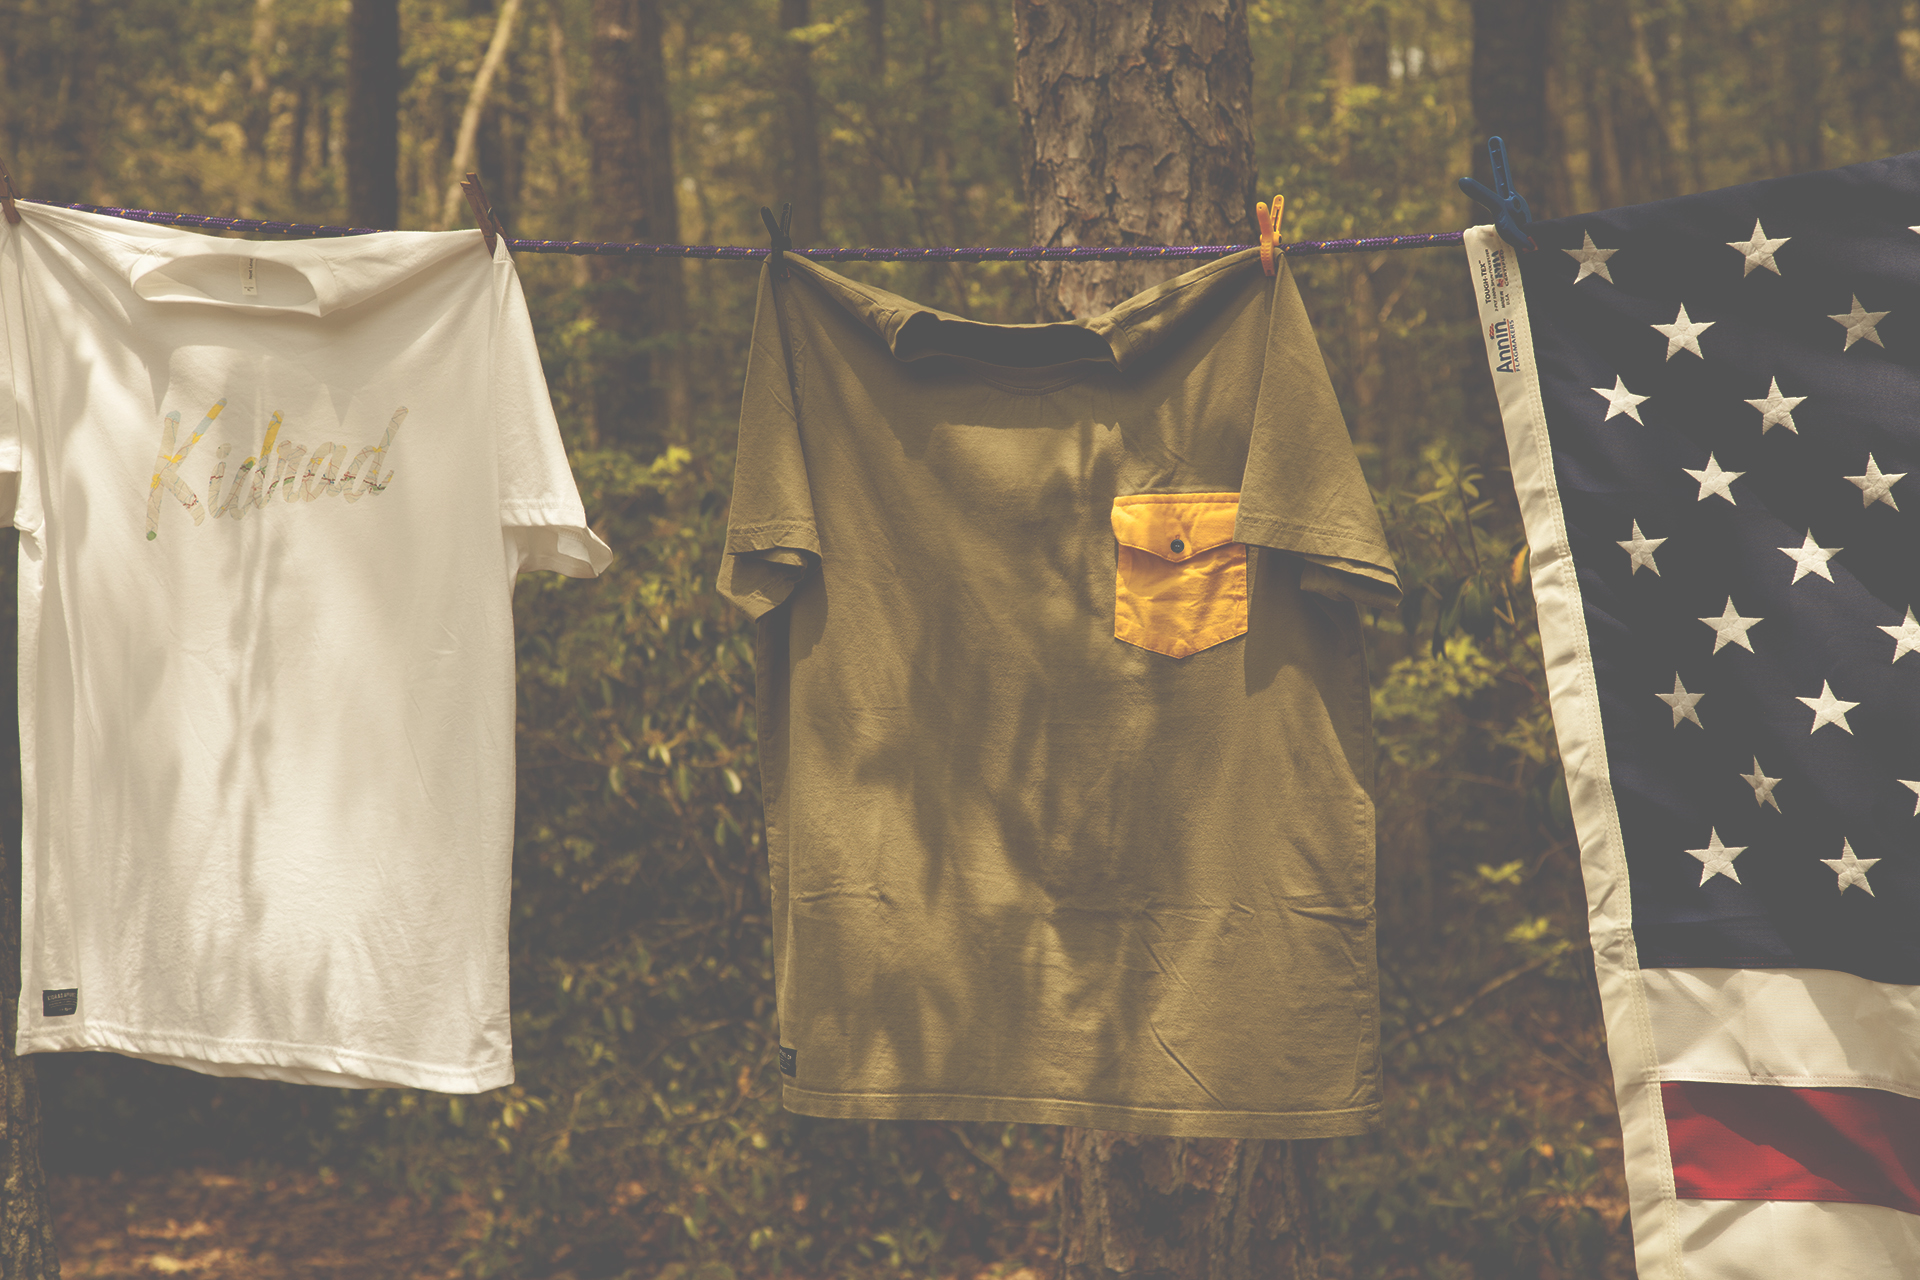 5_Shirts_Clothesline.jpg